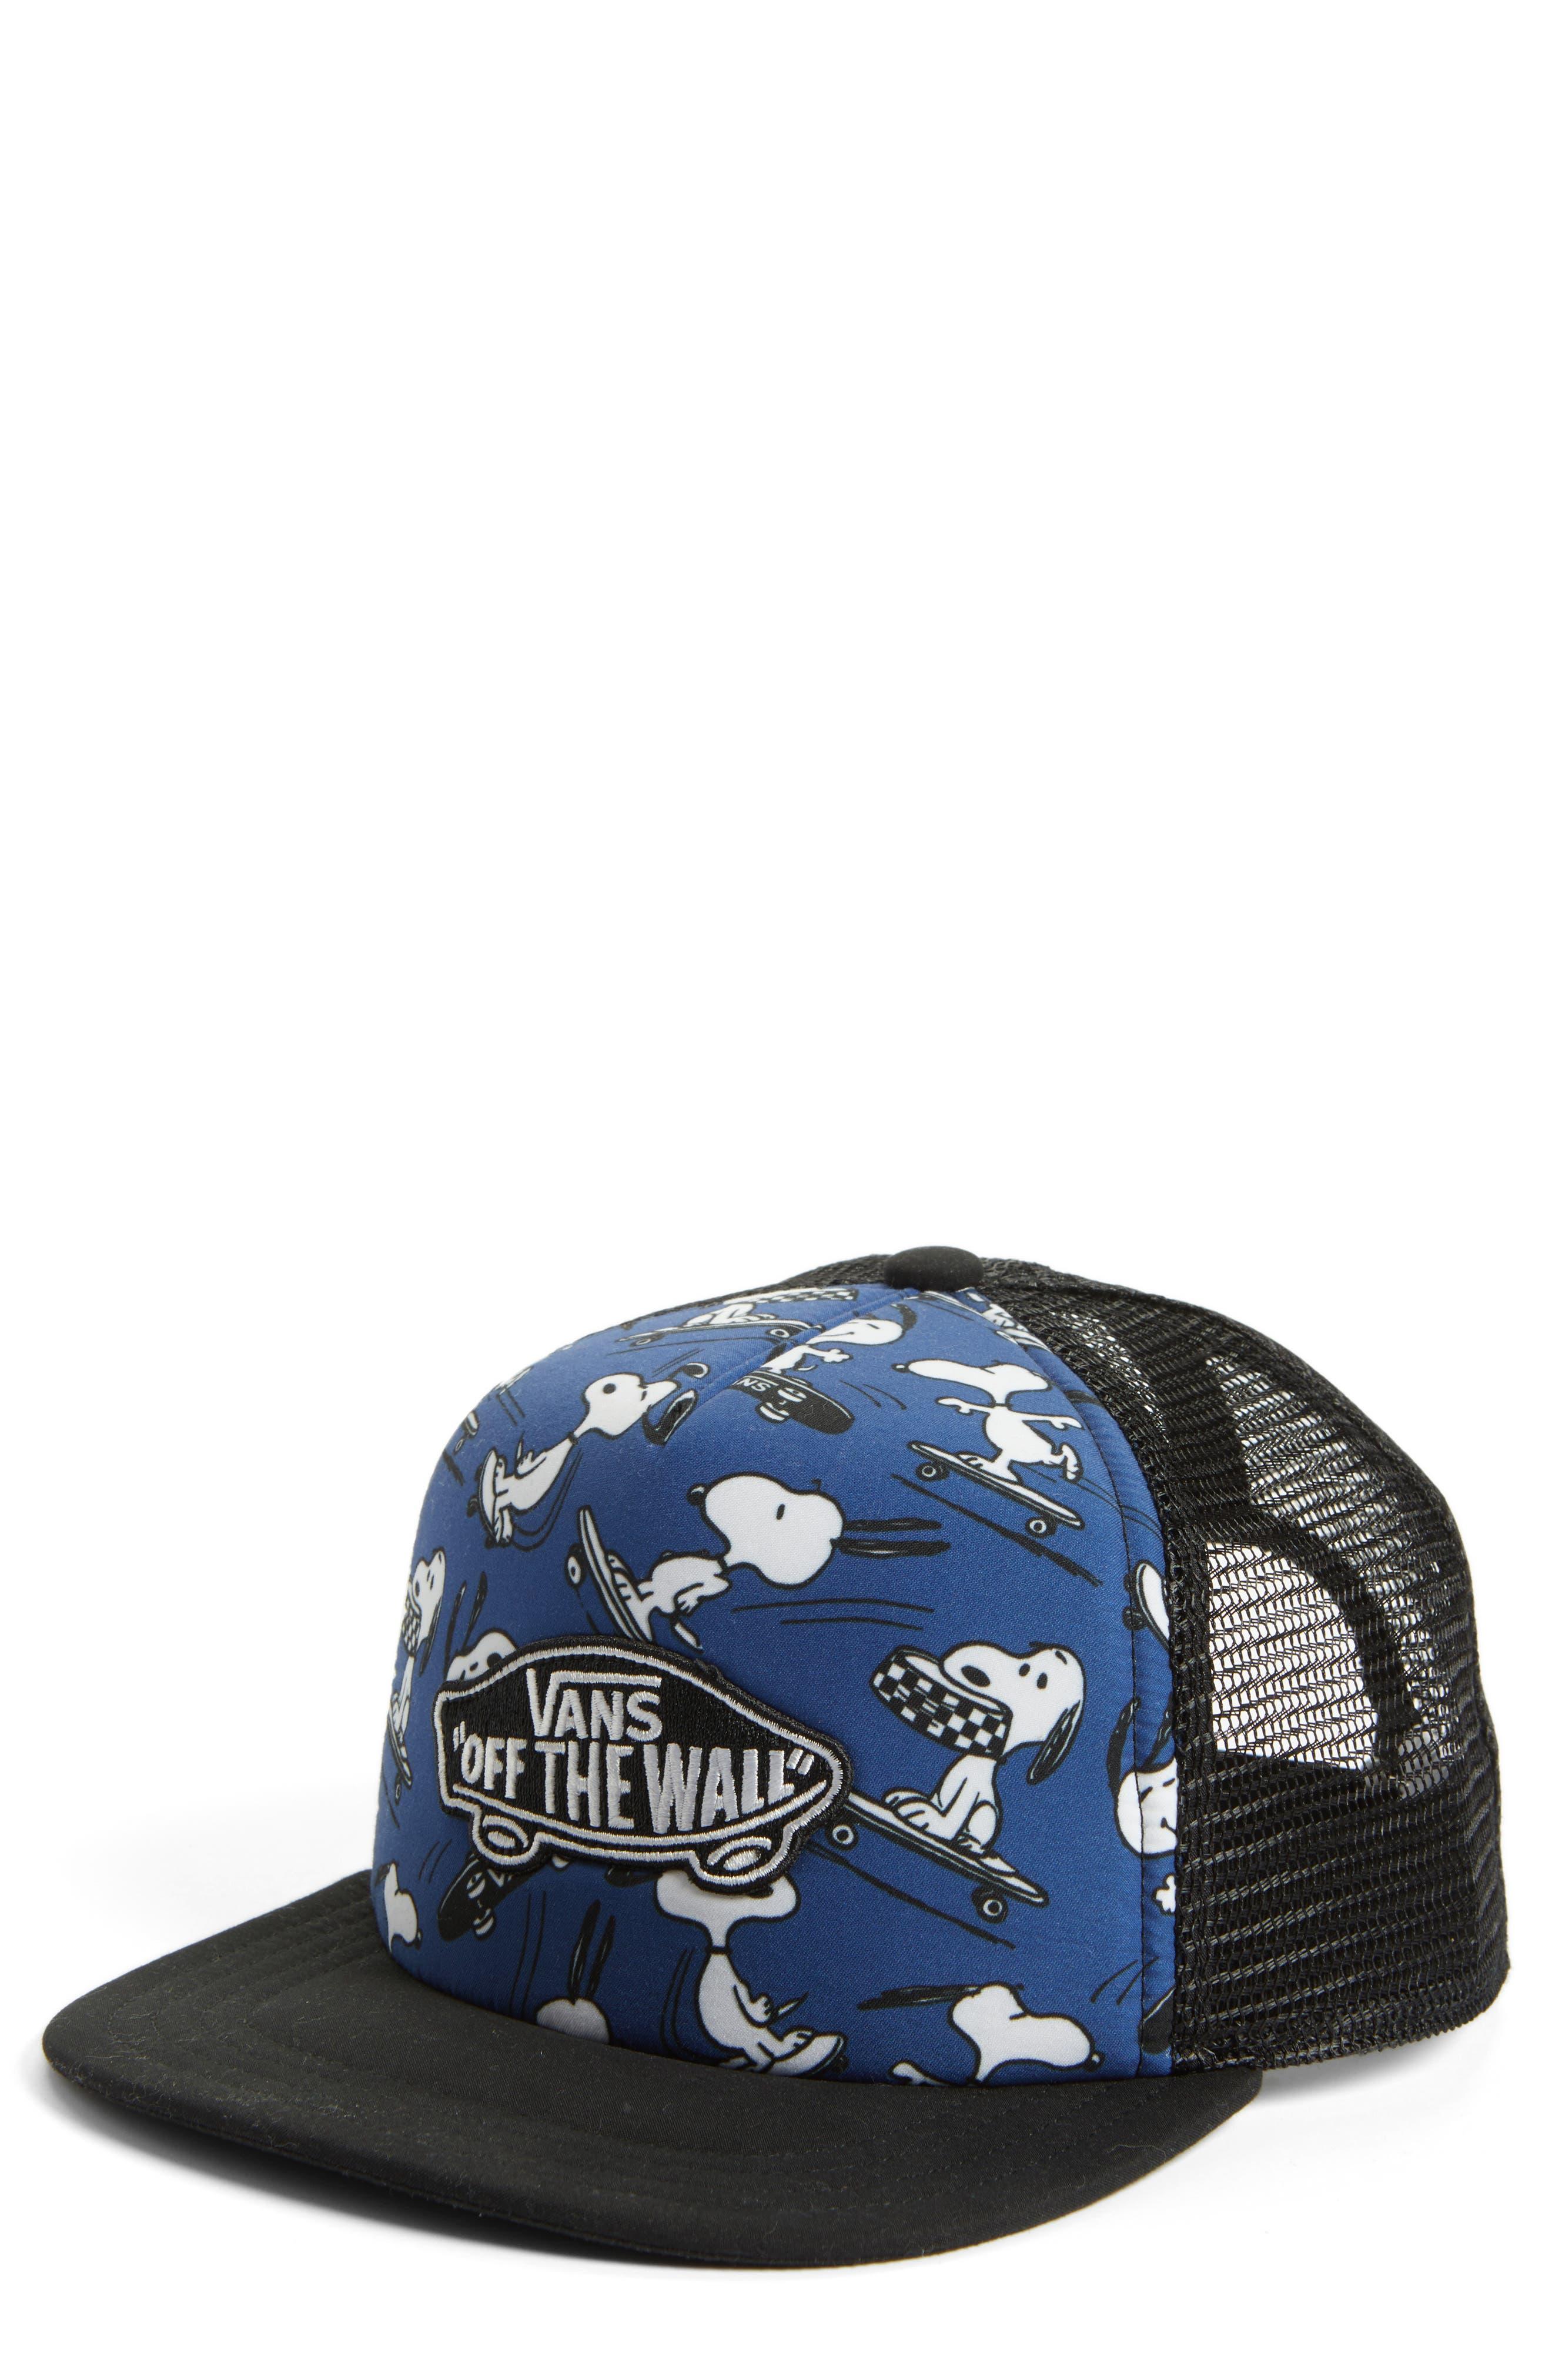 Vans Classic Patch Trucker Hat (Boys)